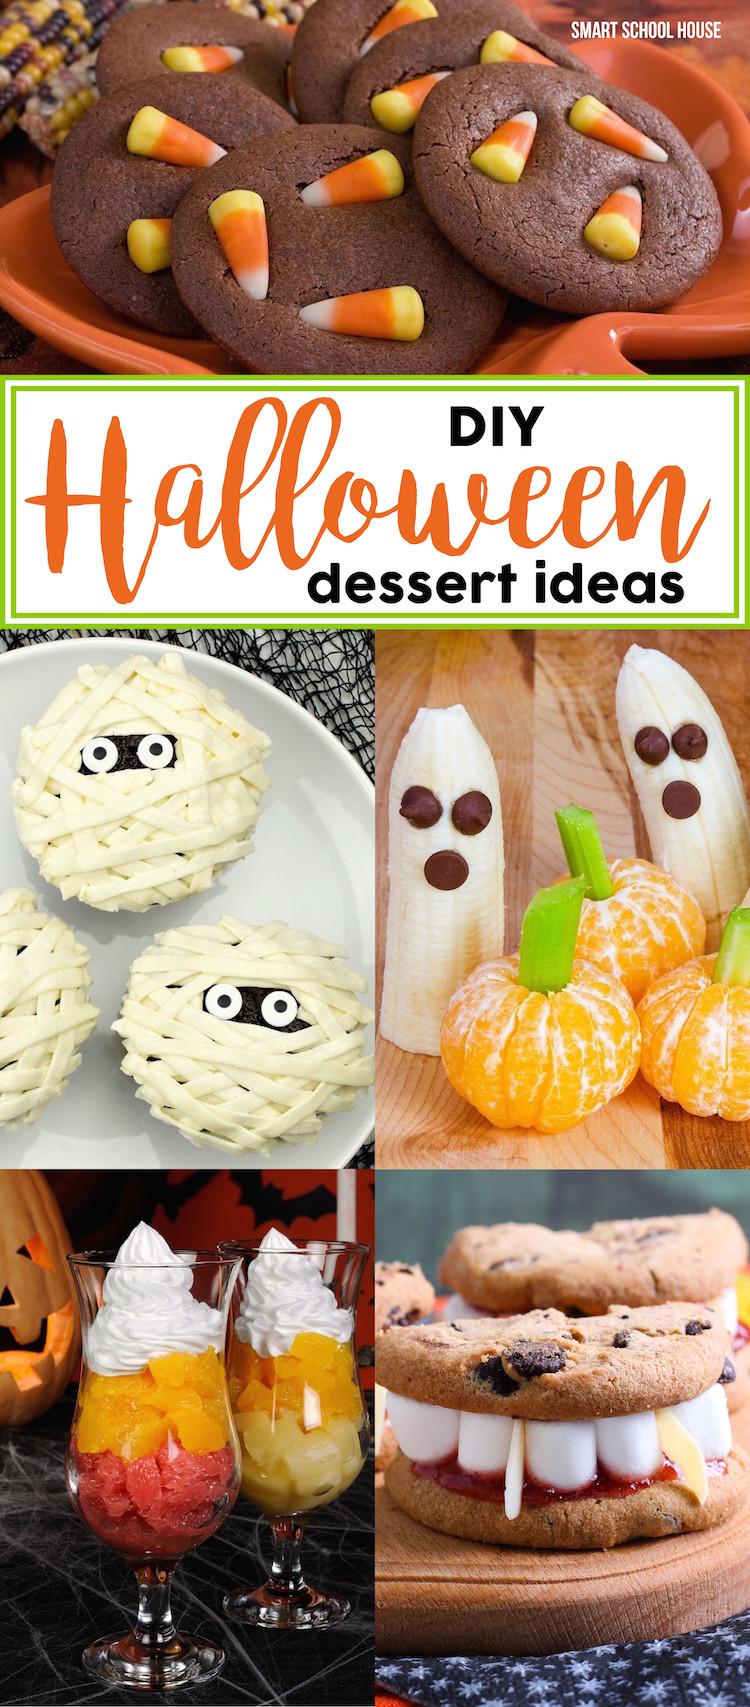 Diy Halloween Desserts  Halloween Dessert Ideas Smart School House